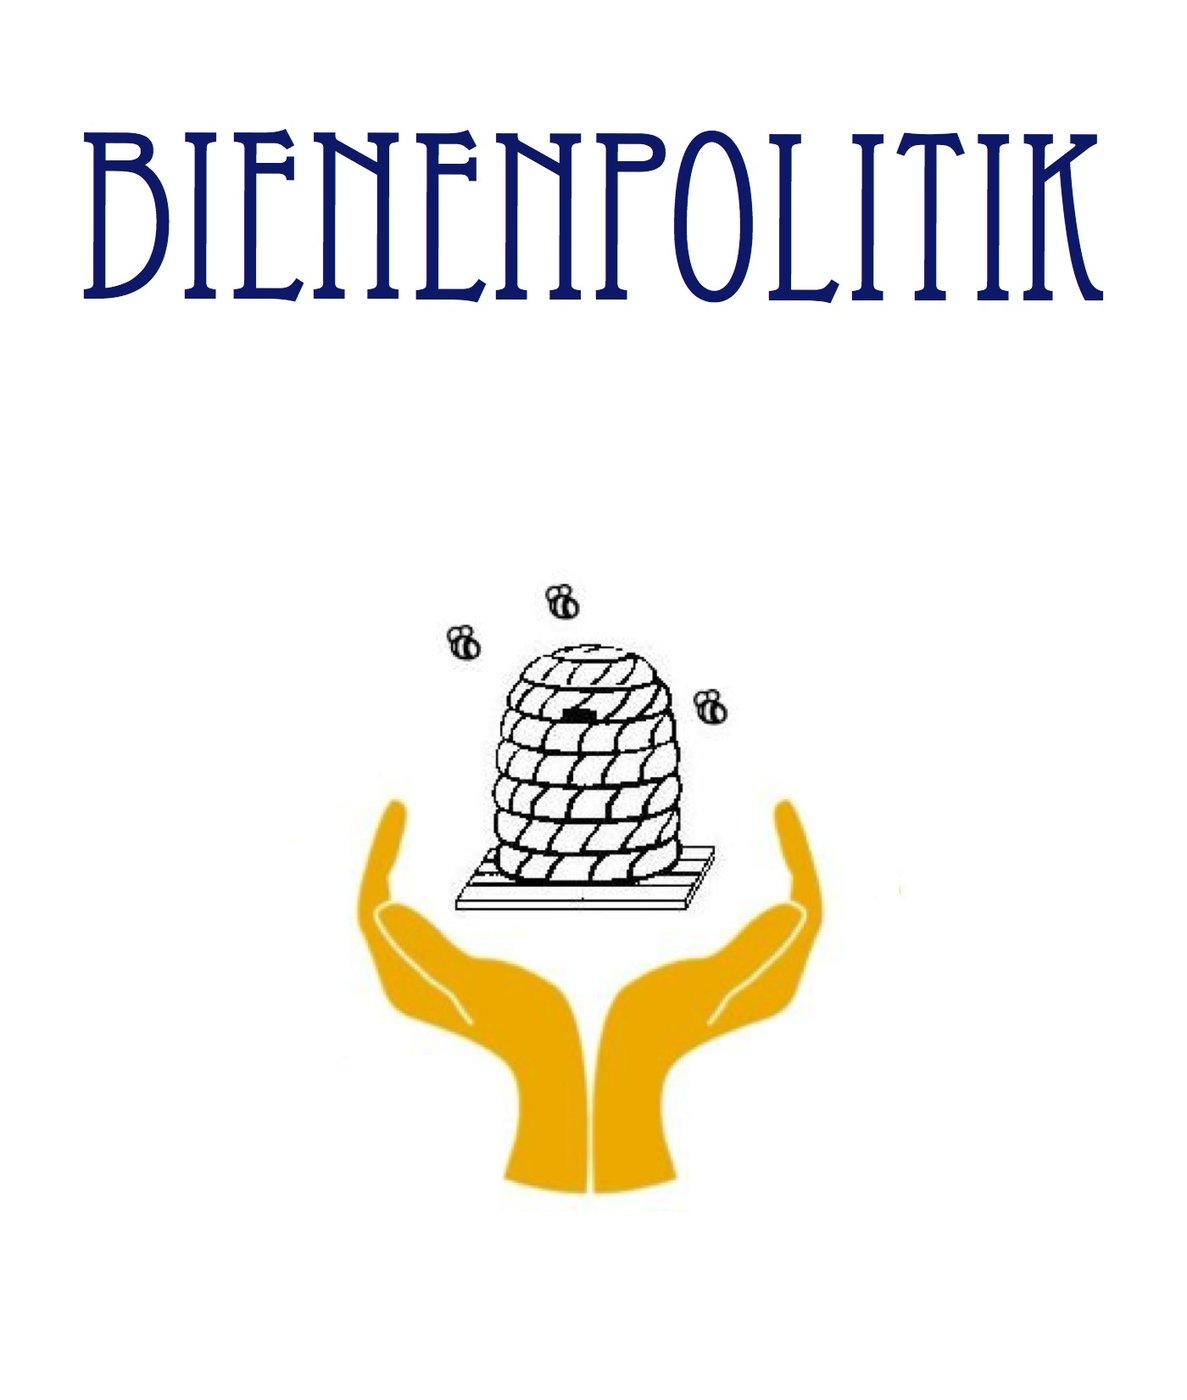 Bienenpolitik (Bienenpolitik)